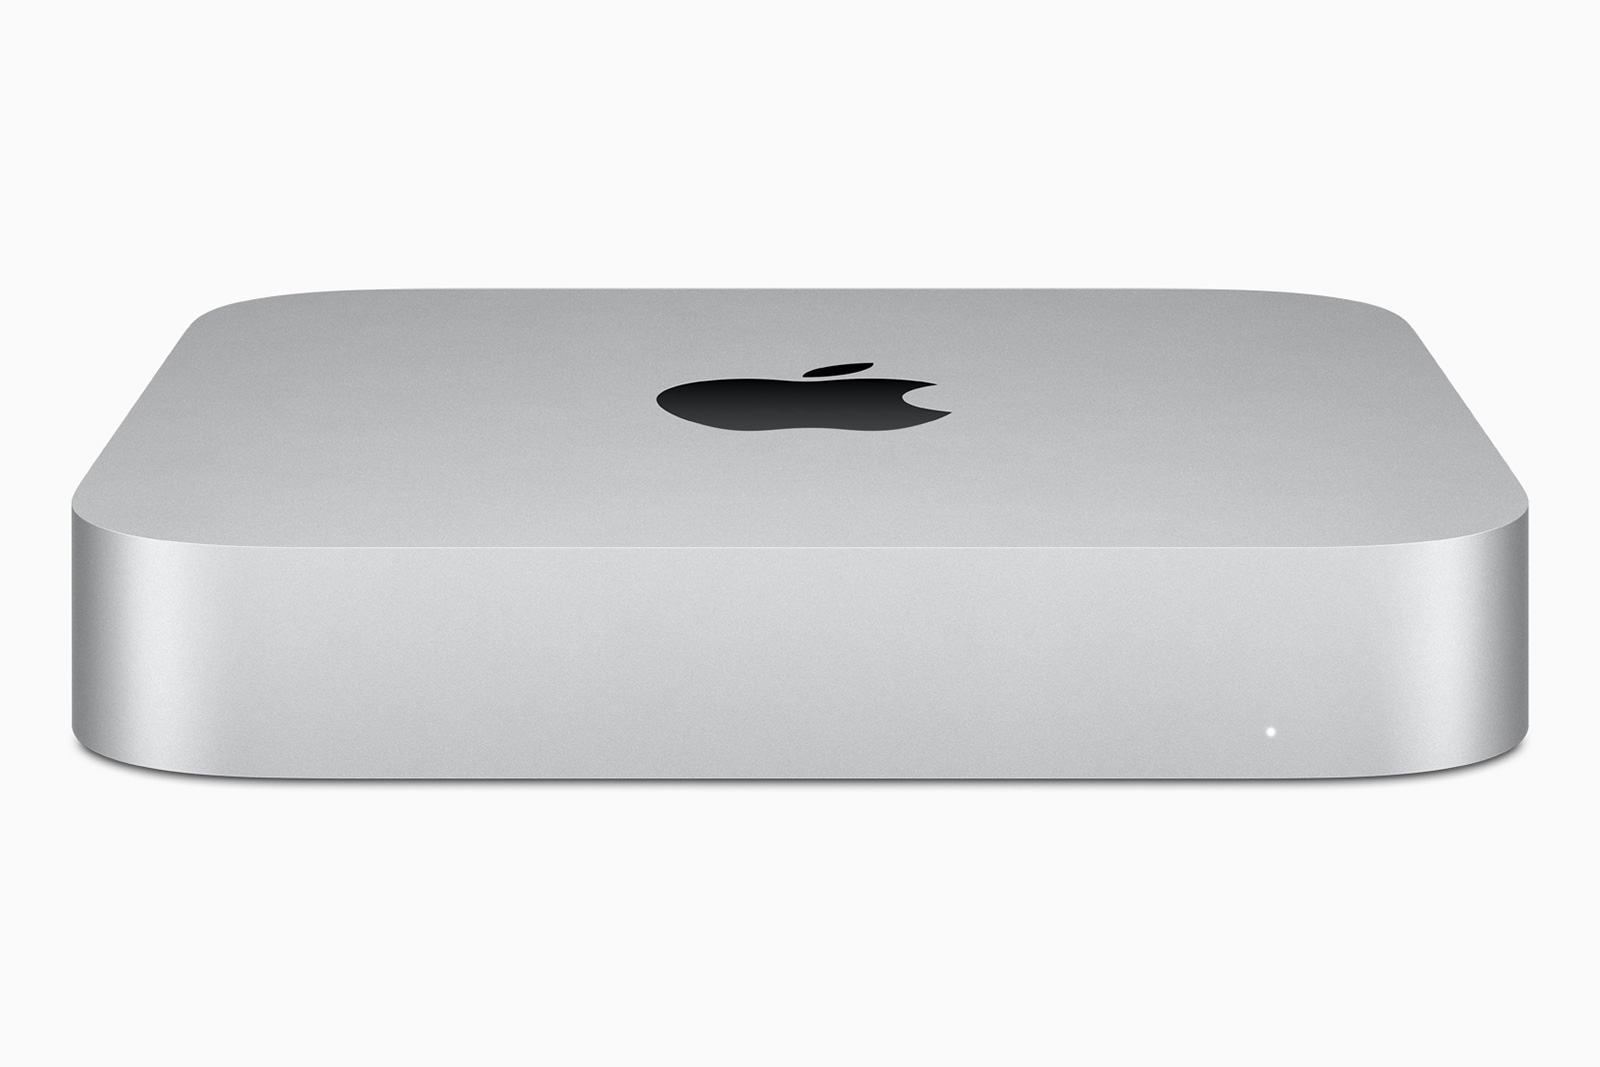 Apple's 512GB Mac Mac M1 returns to a record $ 800 on Amazon